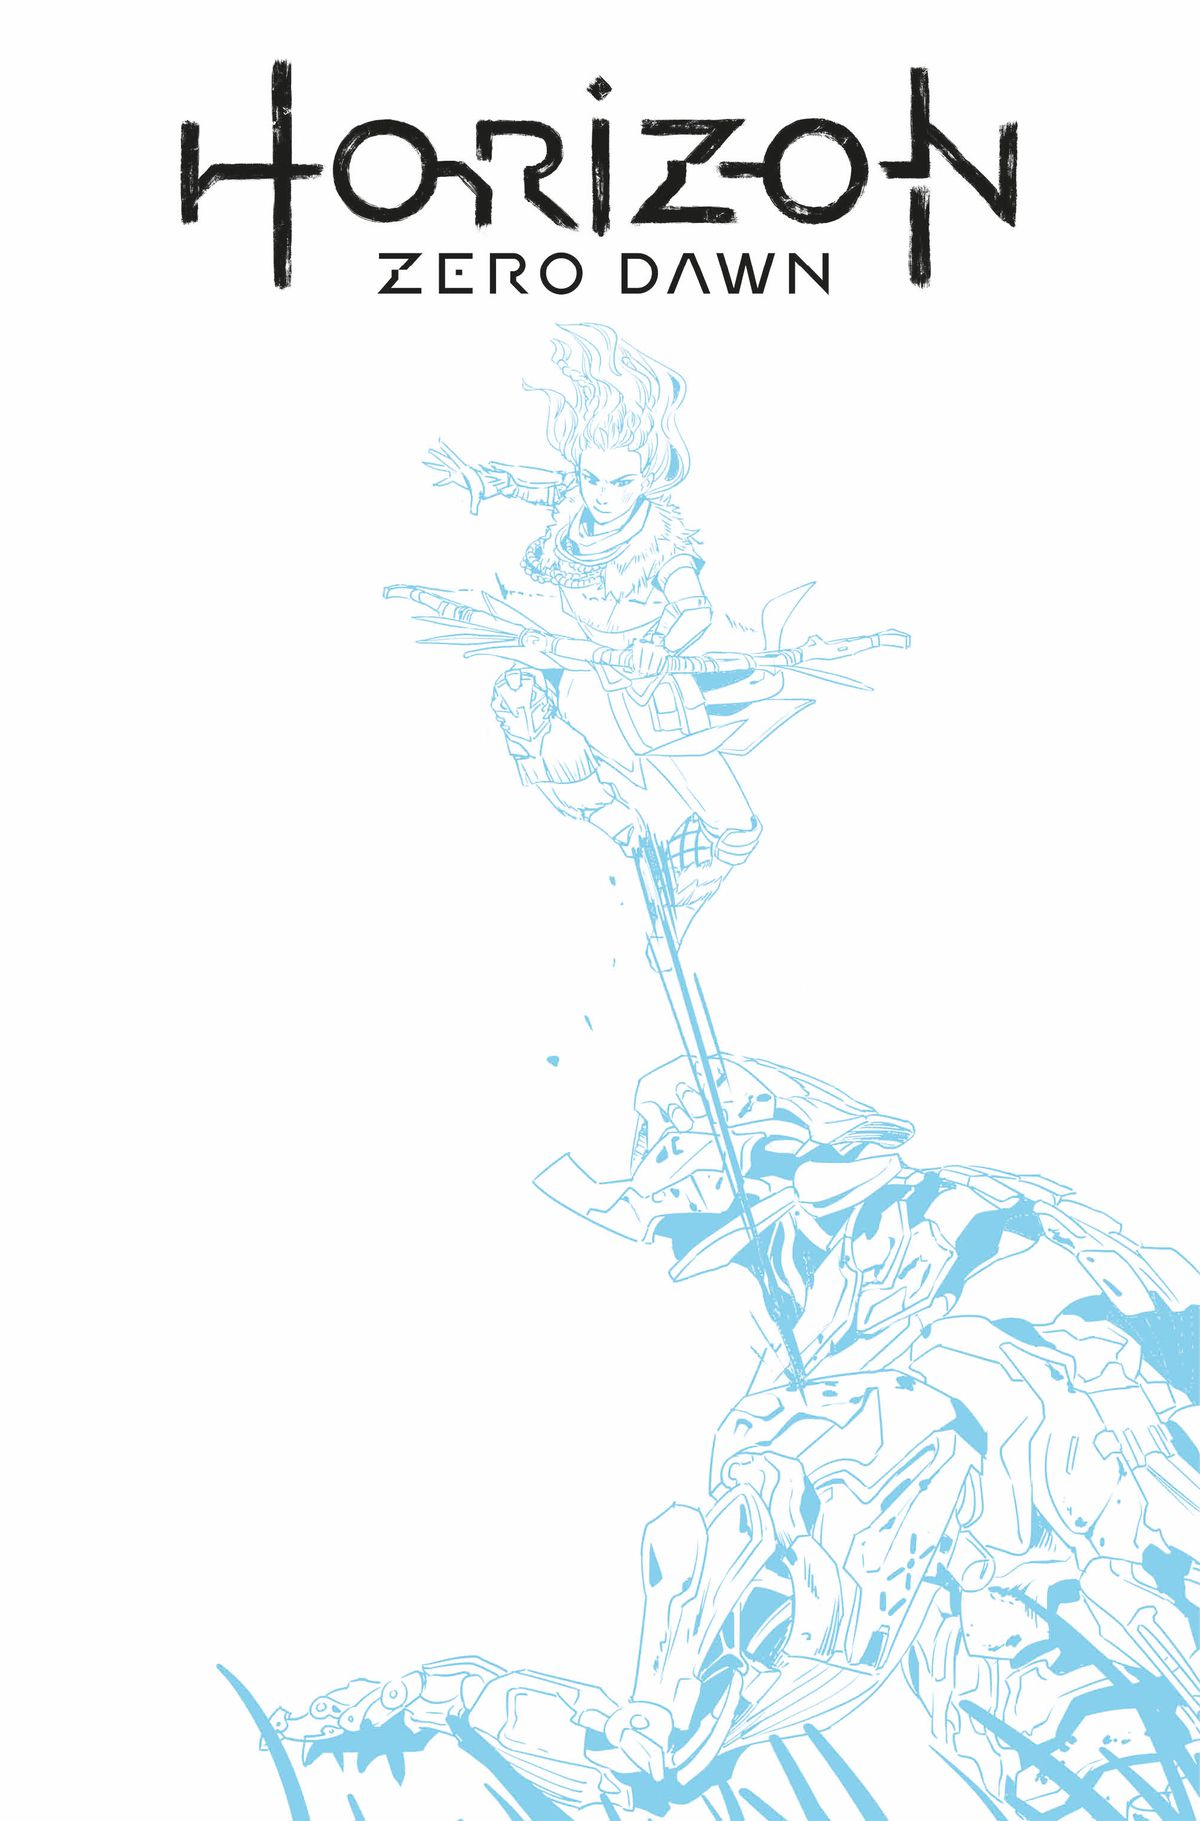 Horizon Zero Dawn #1, Titan Comics (2020) Cover F, a blue line sketch variant